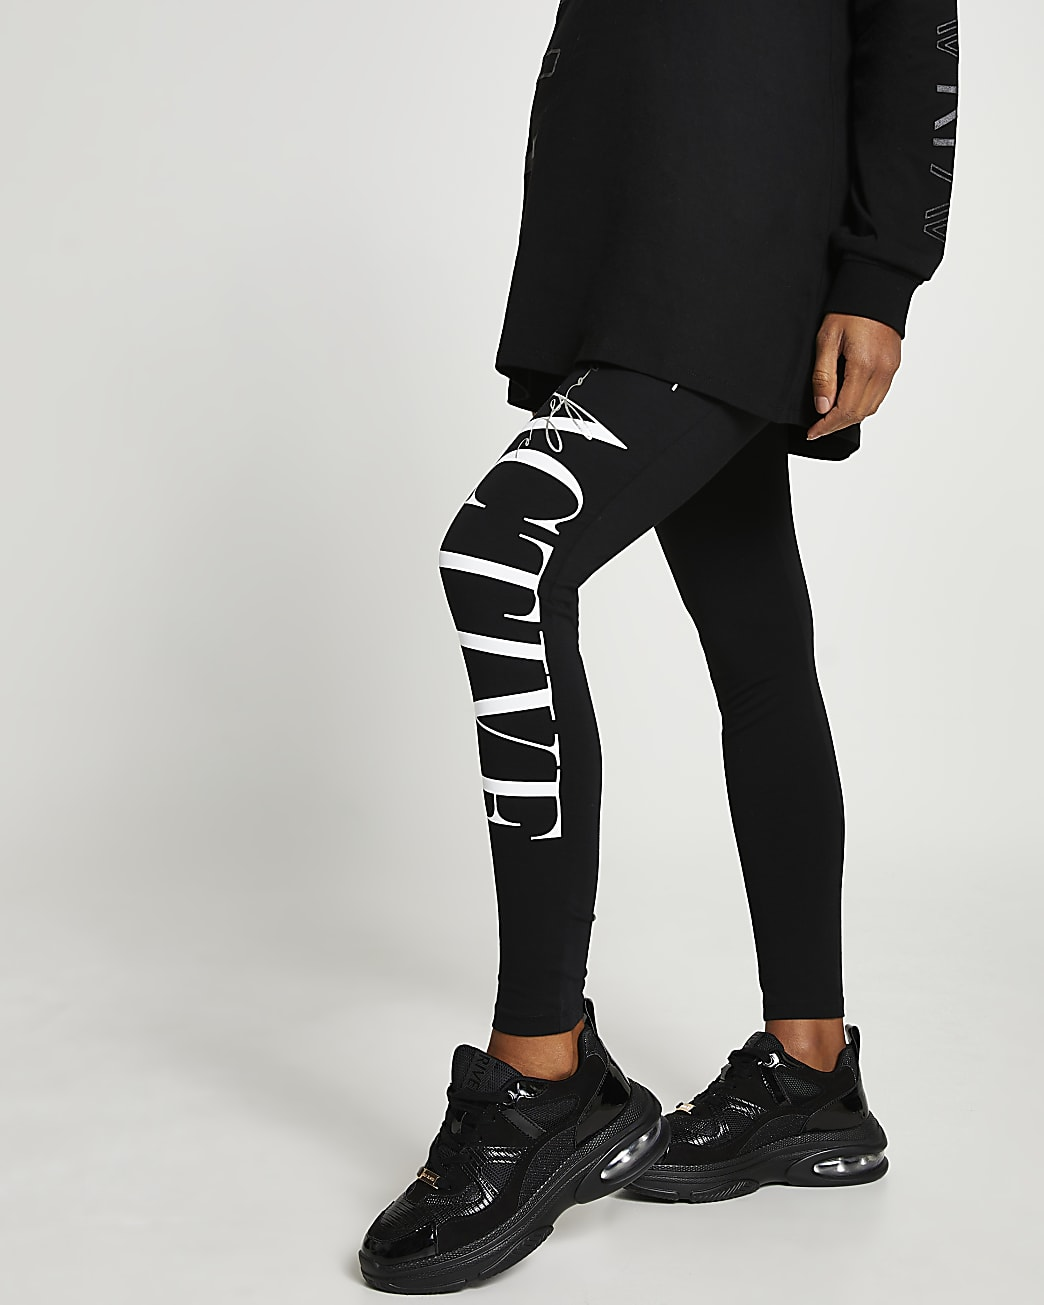 Black RI Active maternity leggings